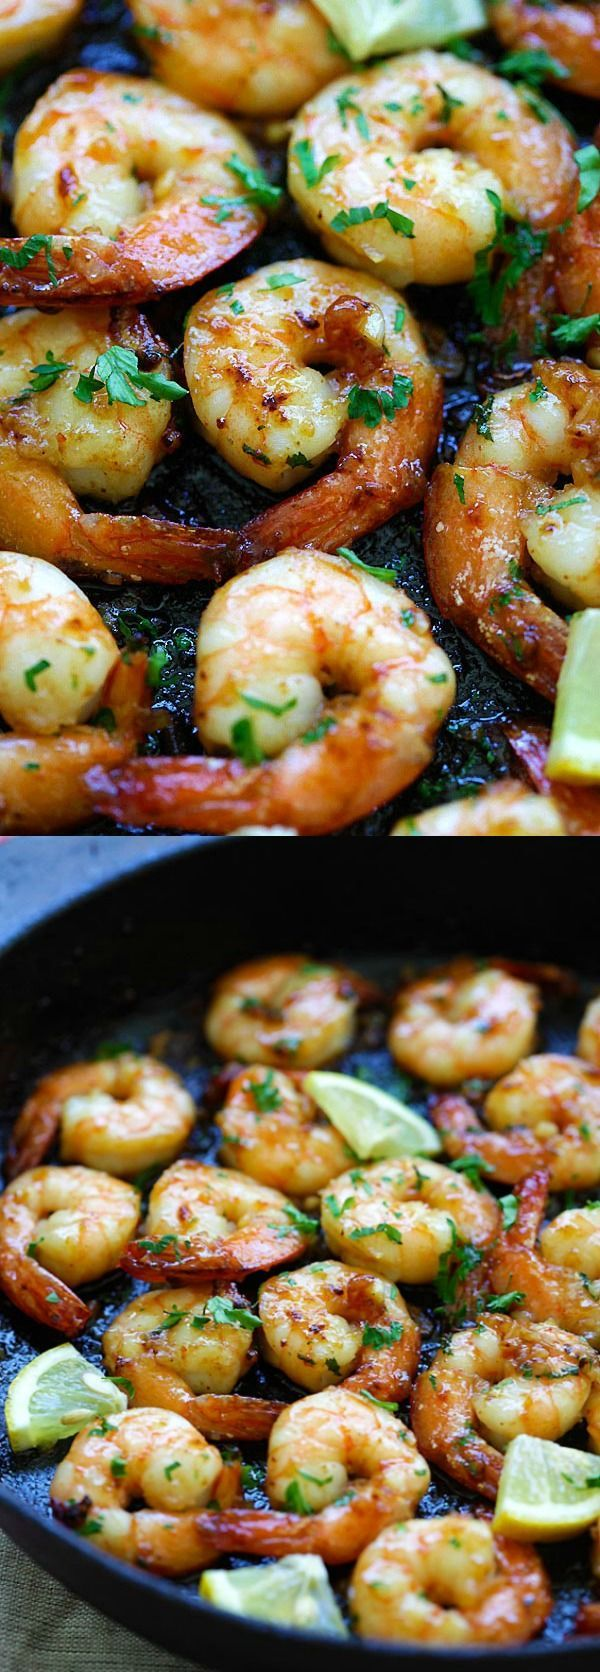 Honey Garlic Shrimp Recipe – easy skillet shrimp with honey garlic sauce with only 4 ingredients.